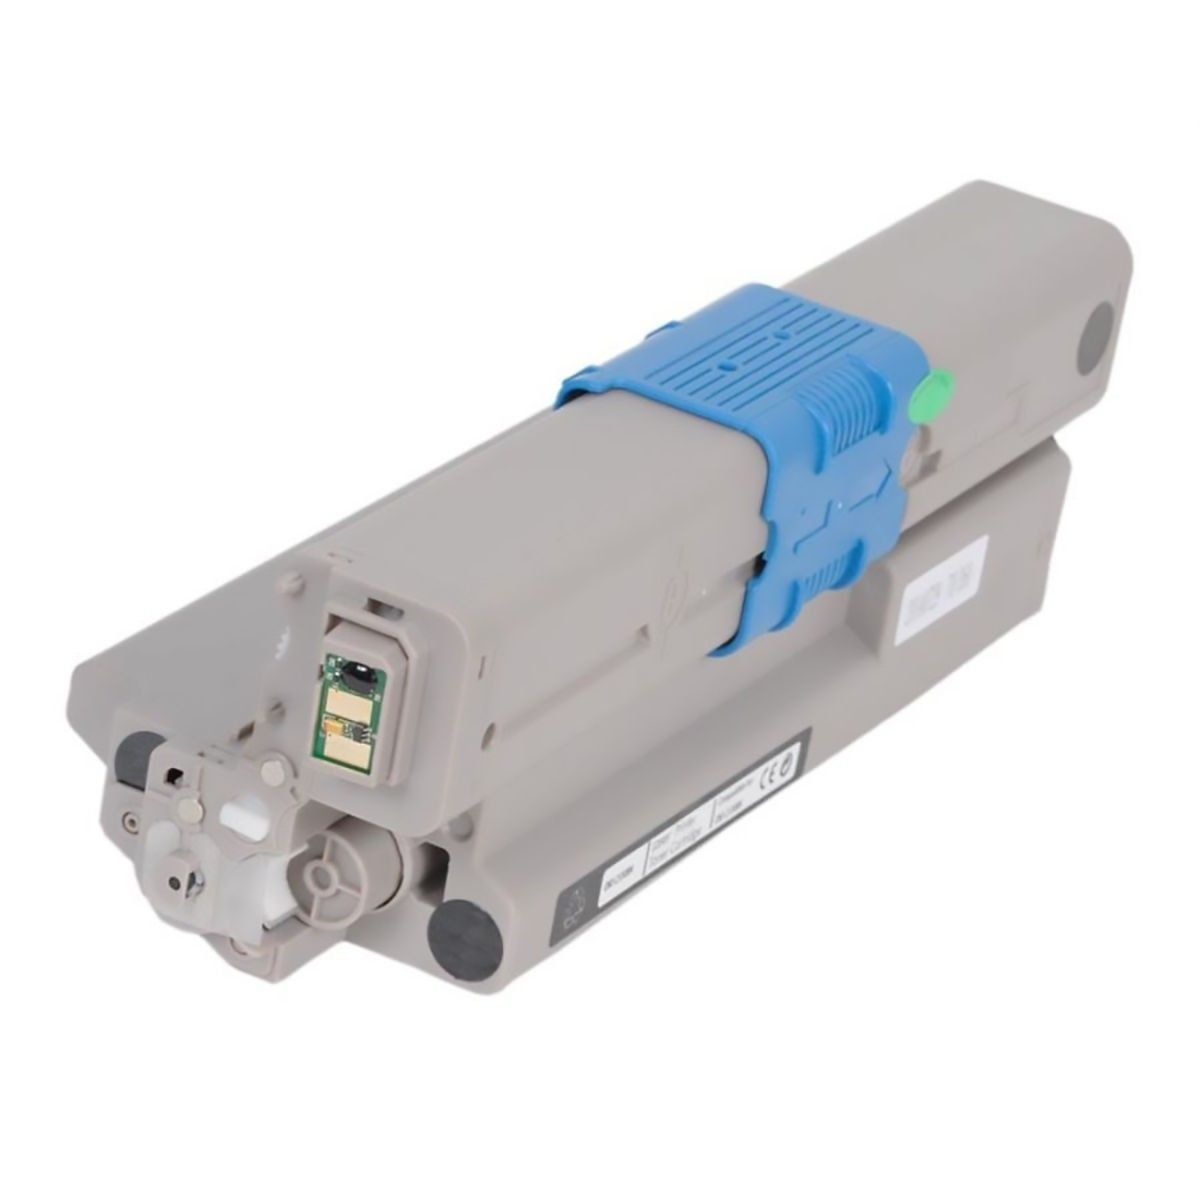 Compatível: Toner C330 C530 para Okidata MC561 MC361 C530dn C330dn C310n MC361dn MC362 CE310dn MC562w / Preto / 3.500